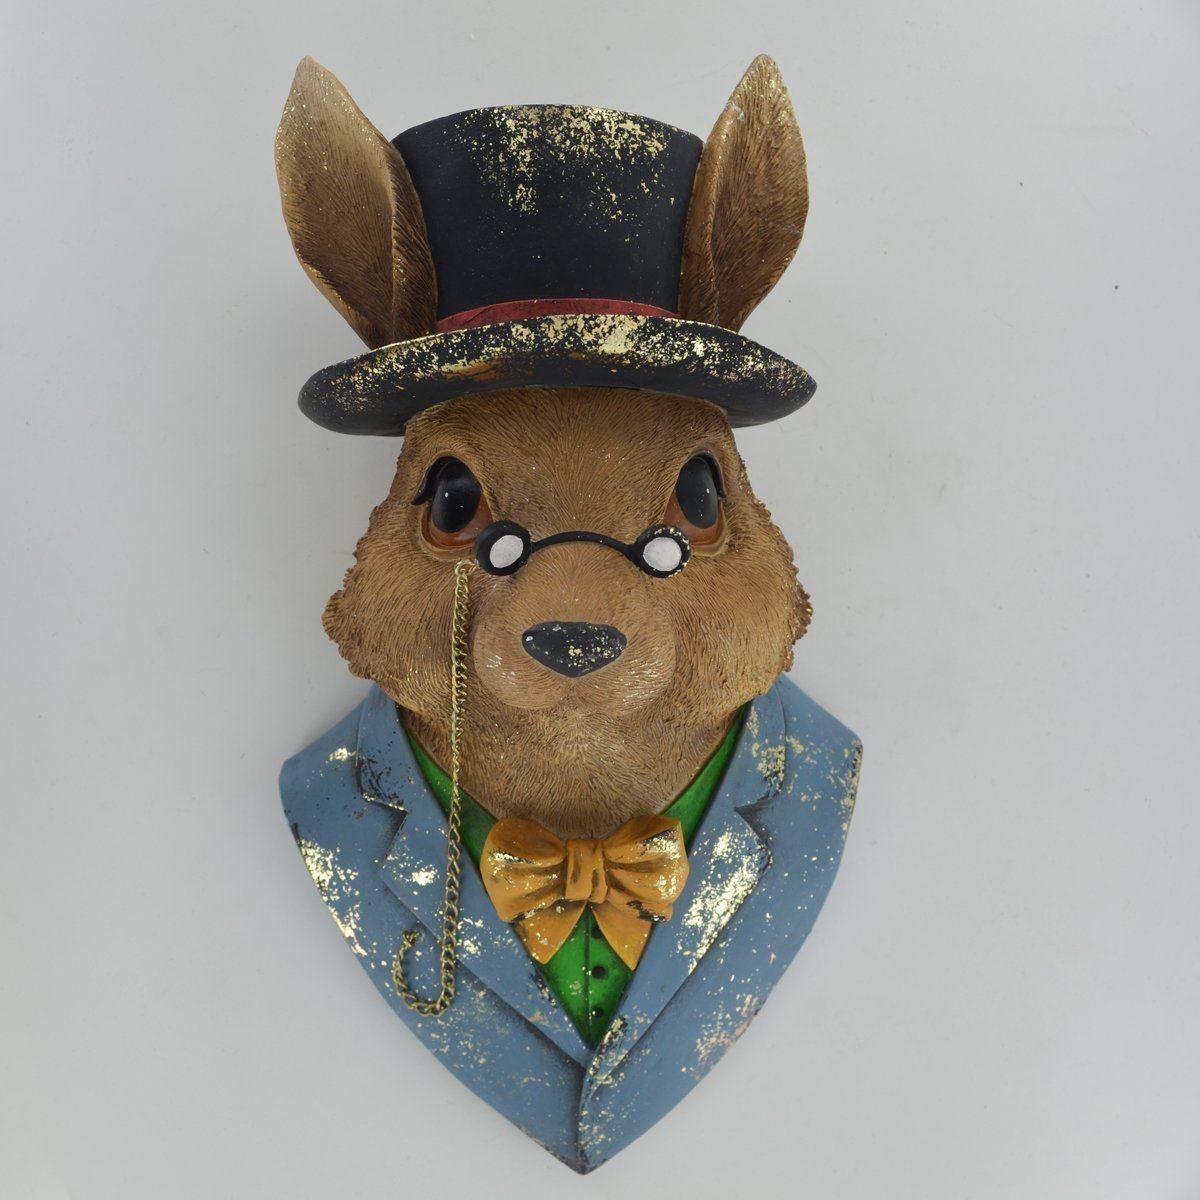 Rabbit Wand Bust Sculpture Style Unique Novelty Decor Fantasy Dapper Animals